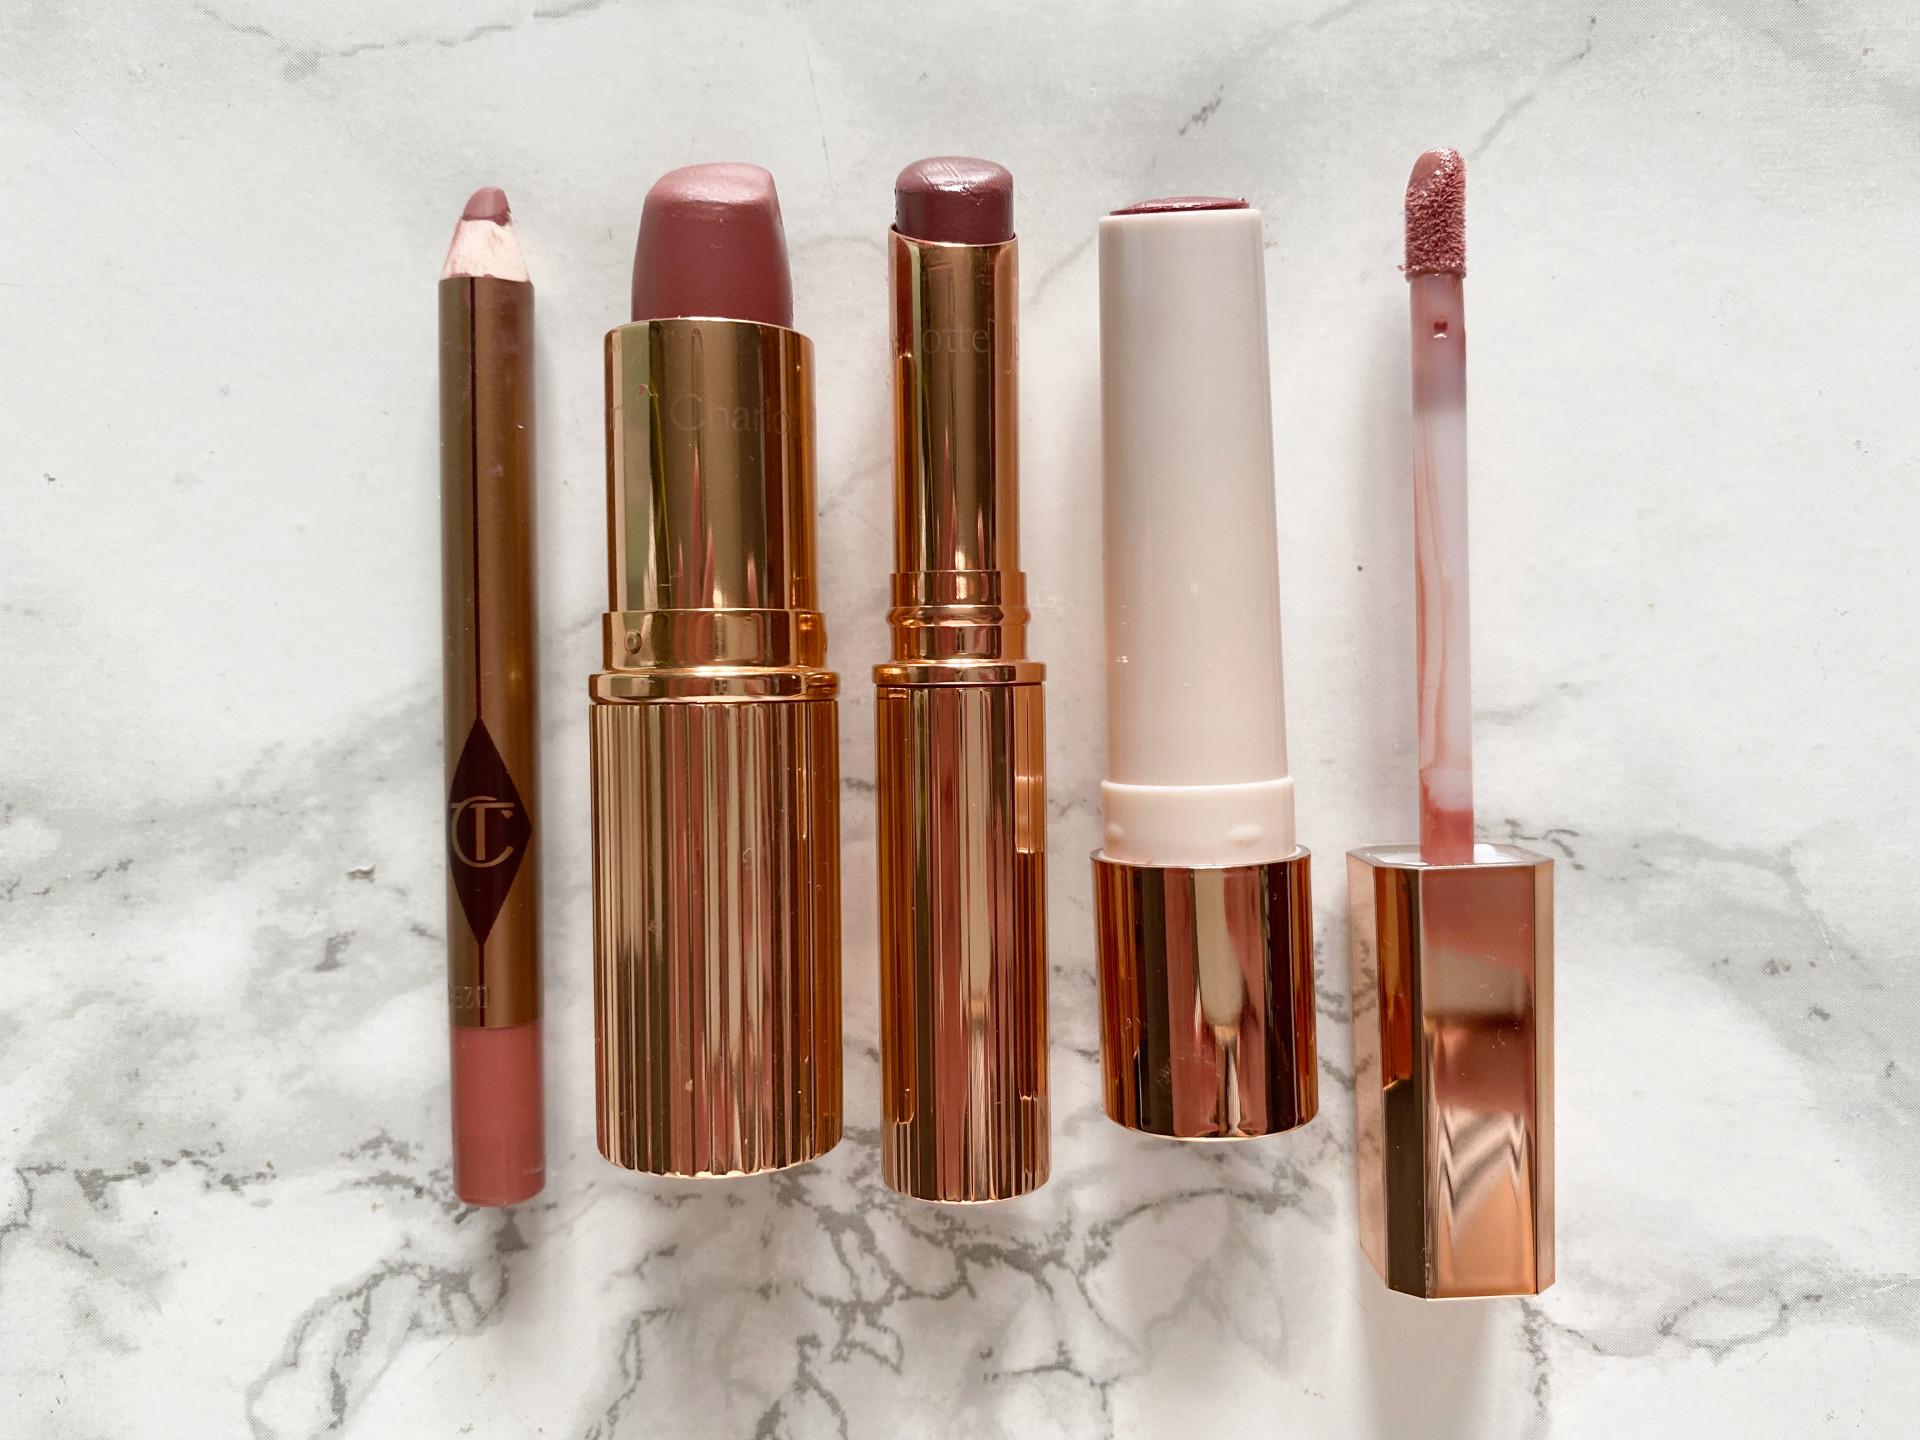 charotte tilbury pilowtalk lip products